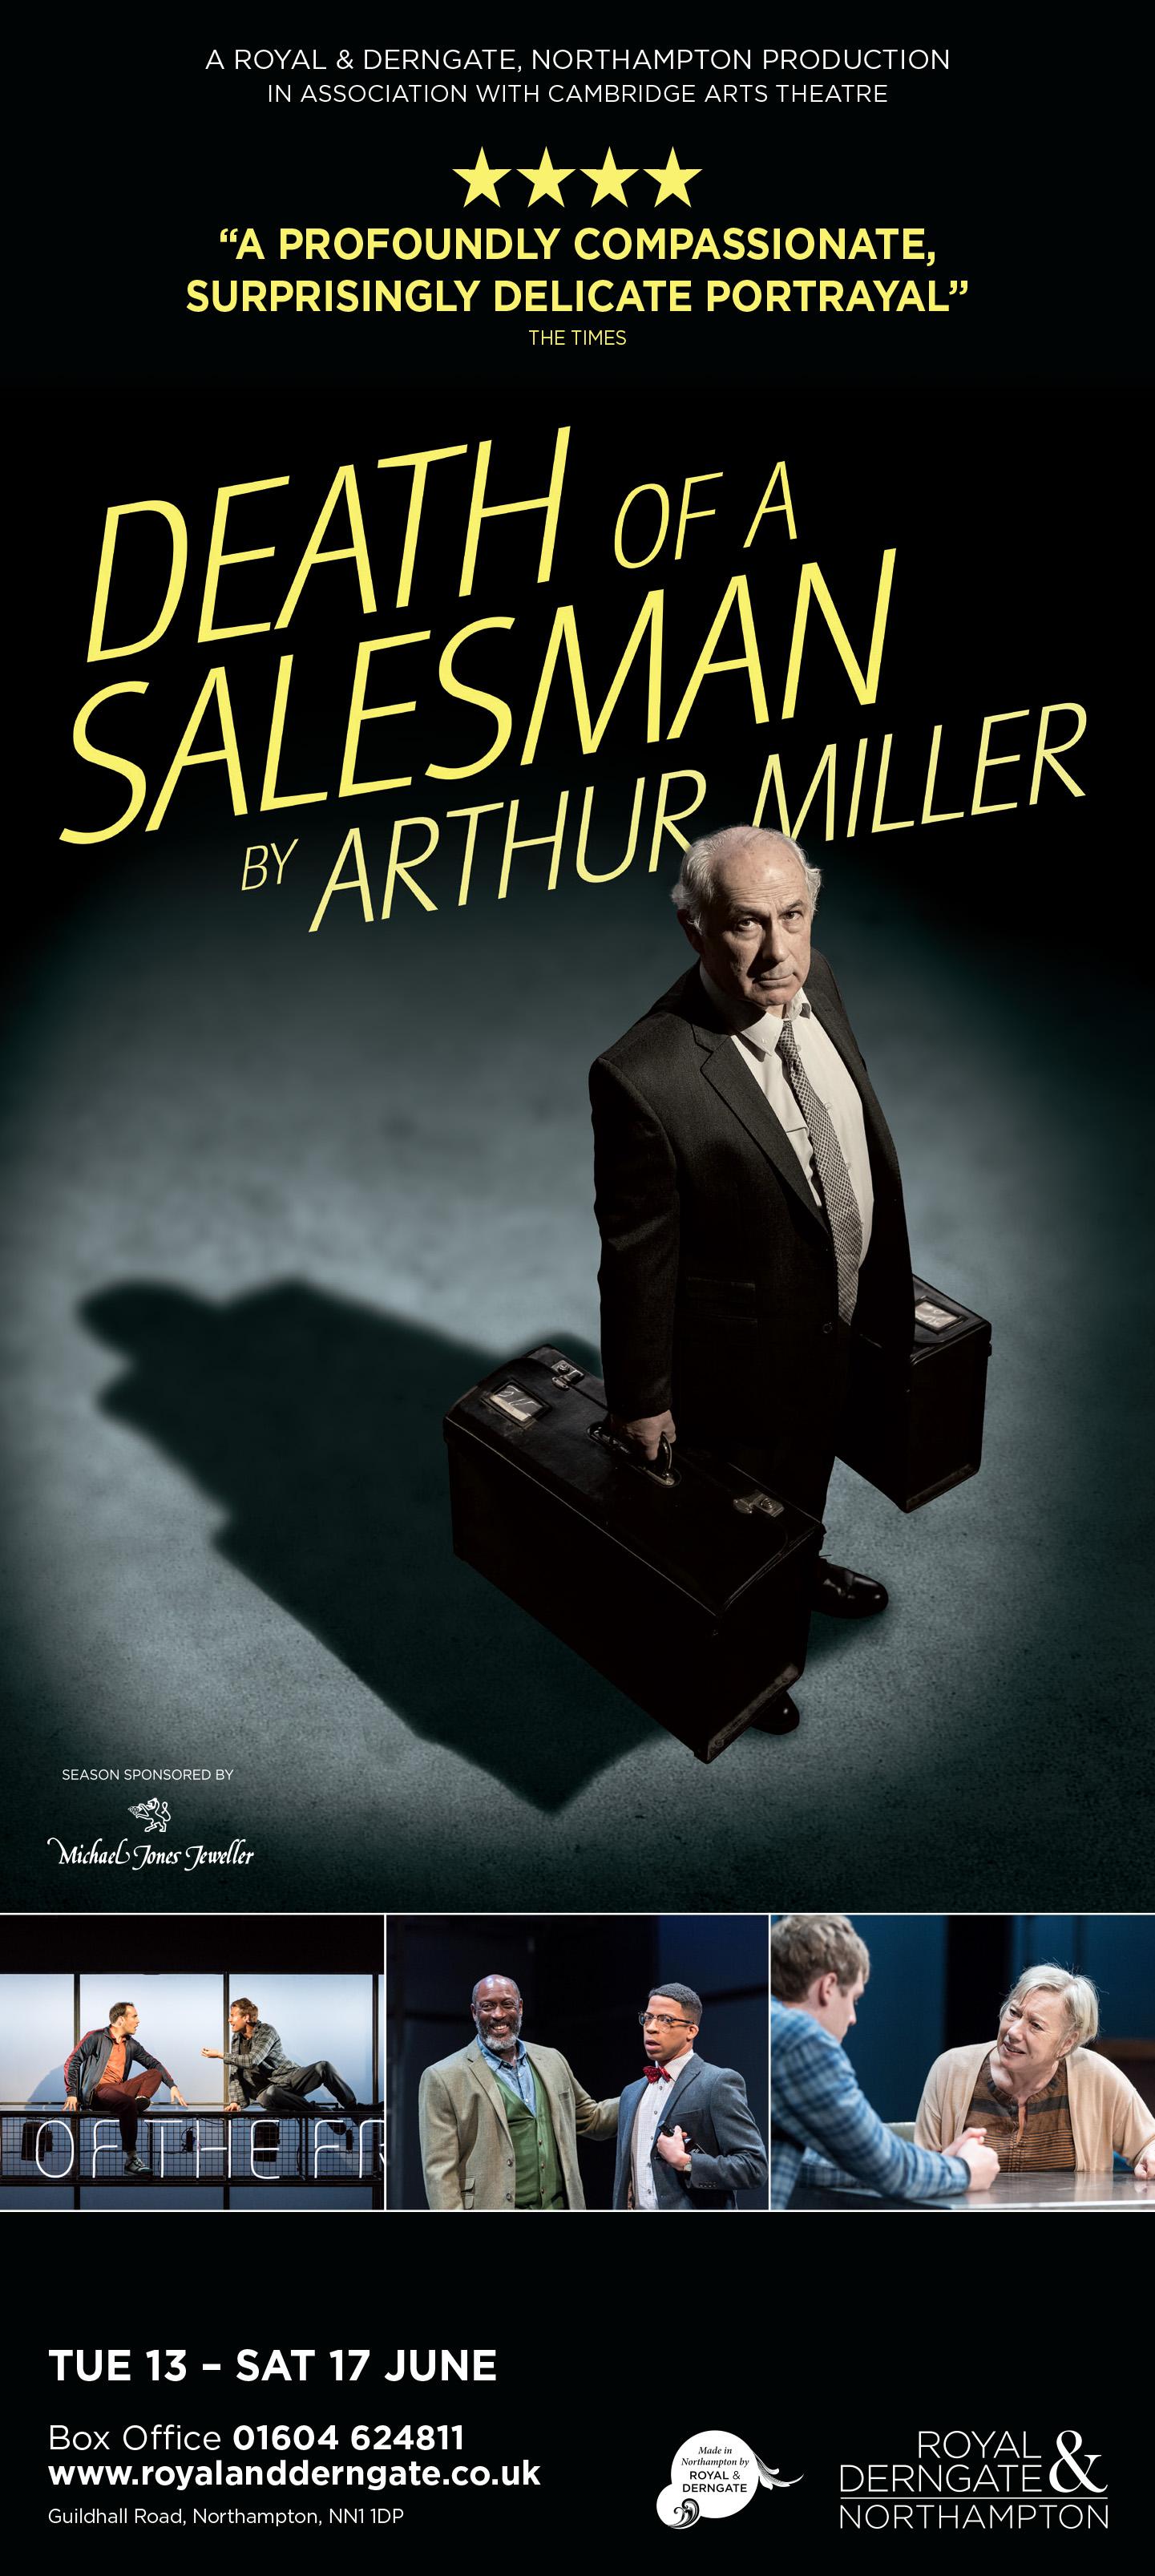 RD0845 Death Of A Salesman Nenequirer half page portrait advert.